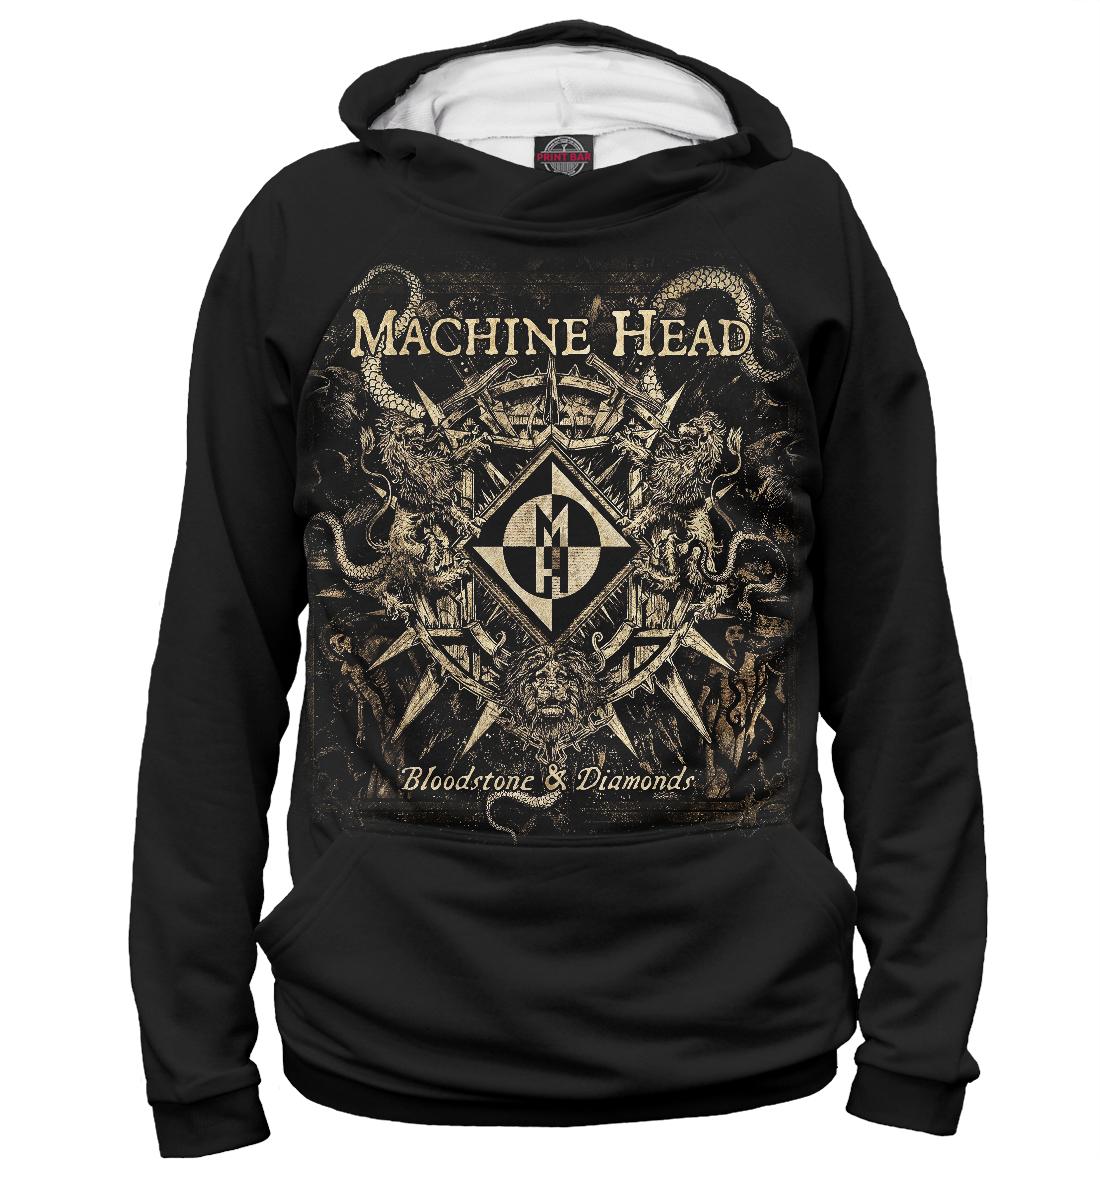 Купить Machine Head, Printbar, Худи, MZK-477891-hud-1